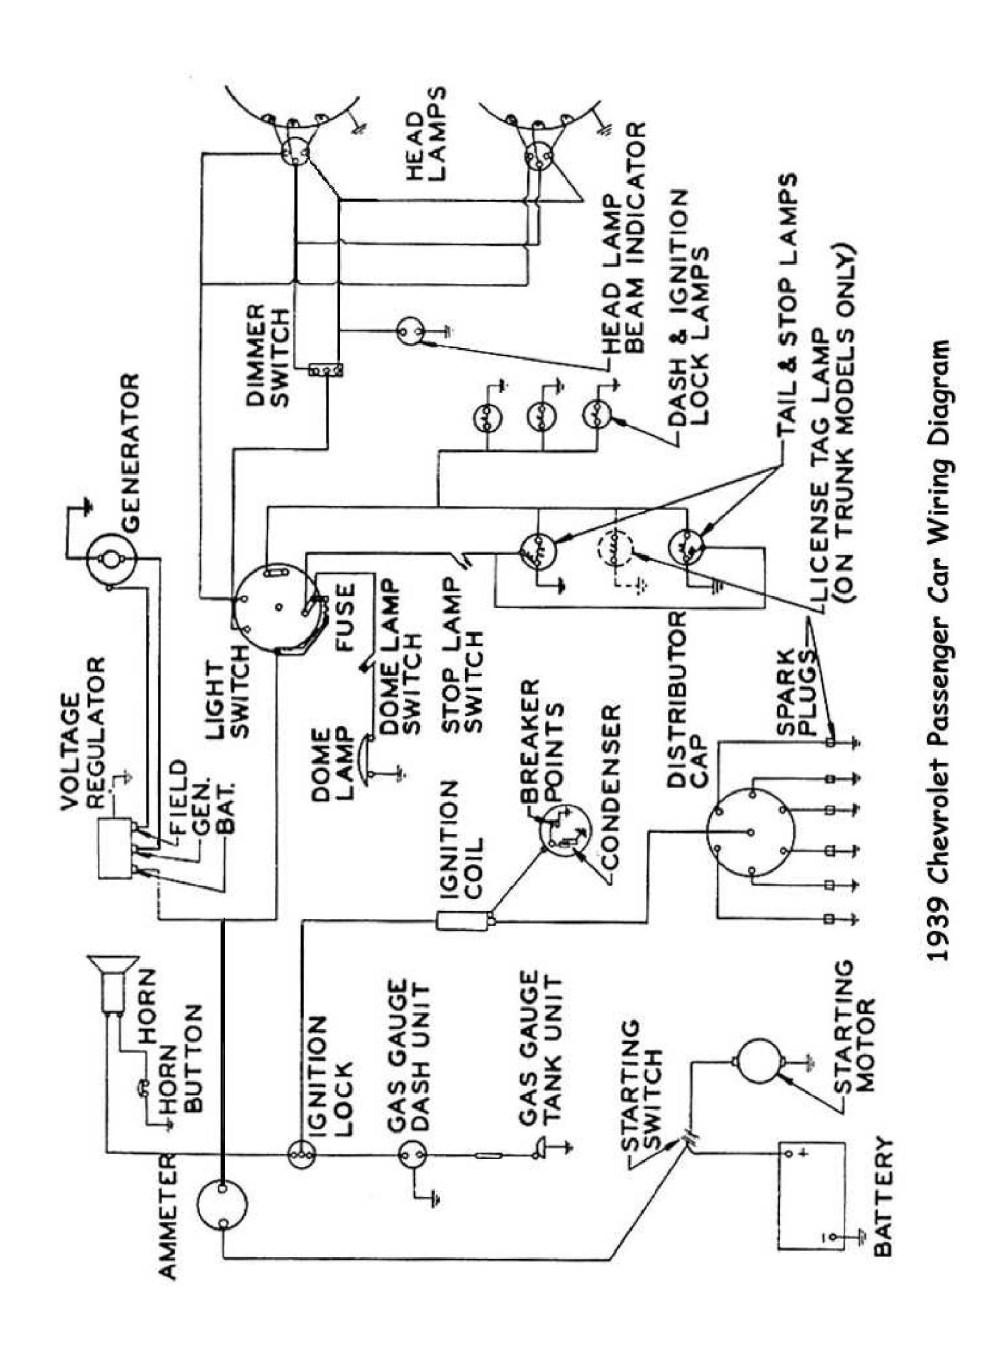 medium resolution of 65 chevy alternator wiring diagram